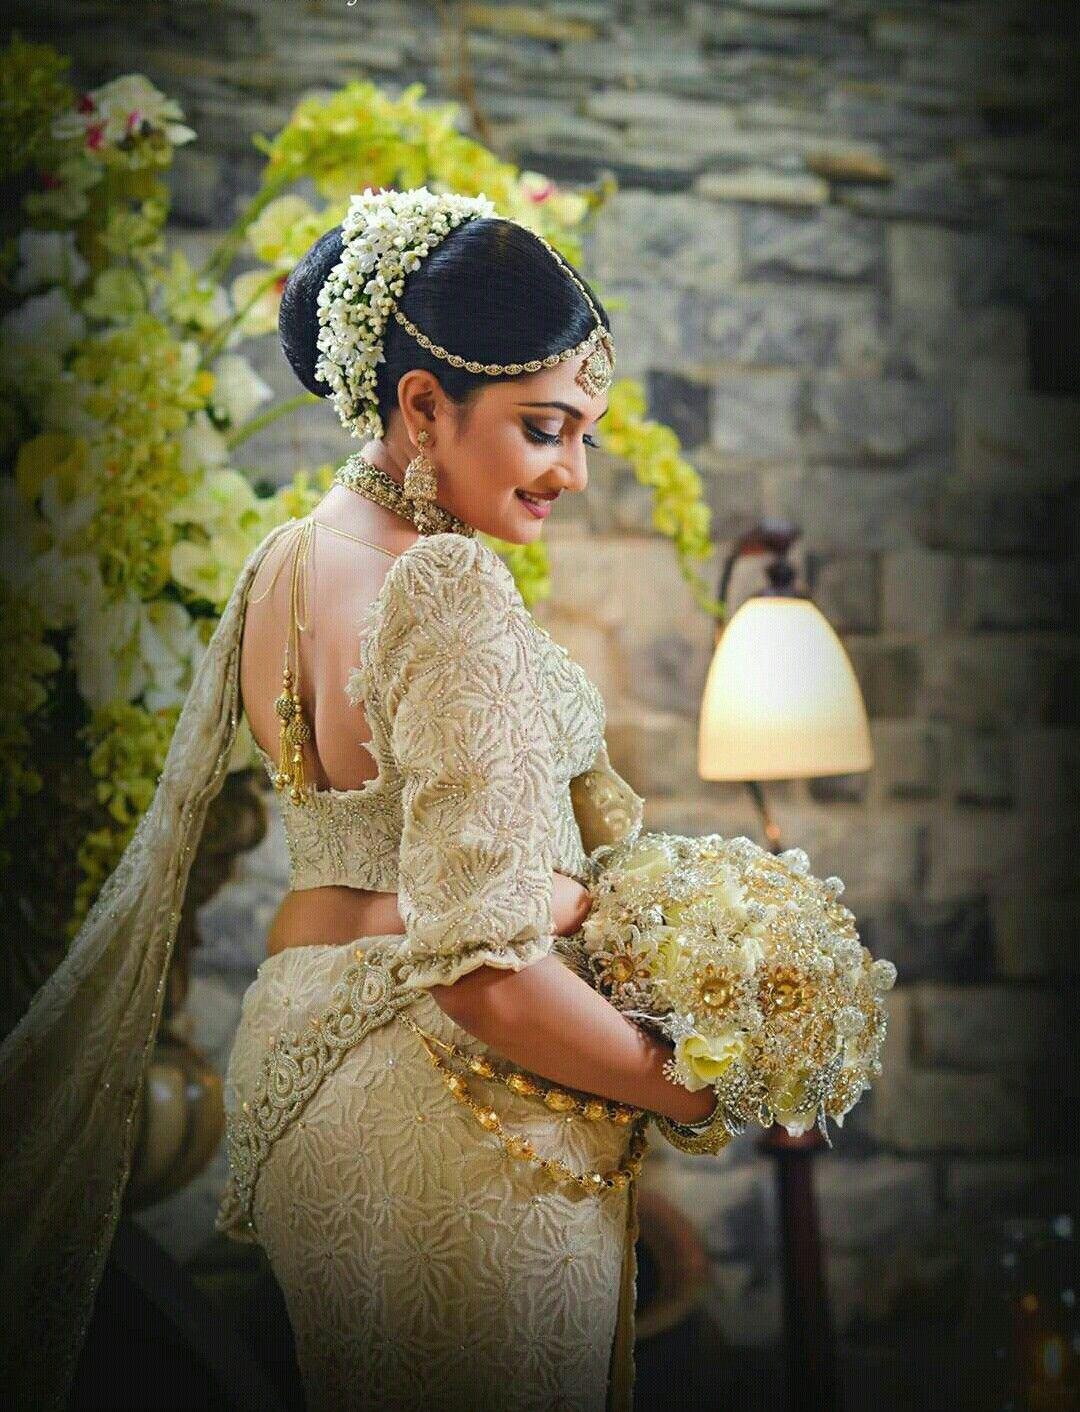 Pin by Yashodara Rathnathilaka on Kandyan Brides | Bridal hair inspiration, Bridle dress, Bridal ...